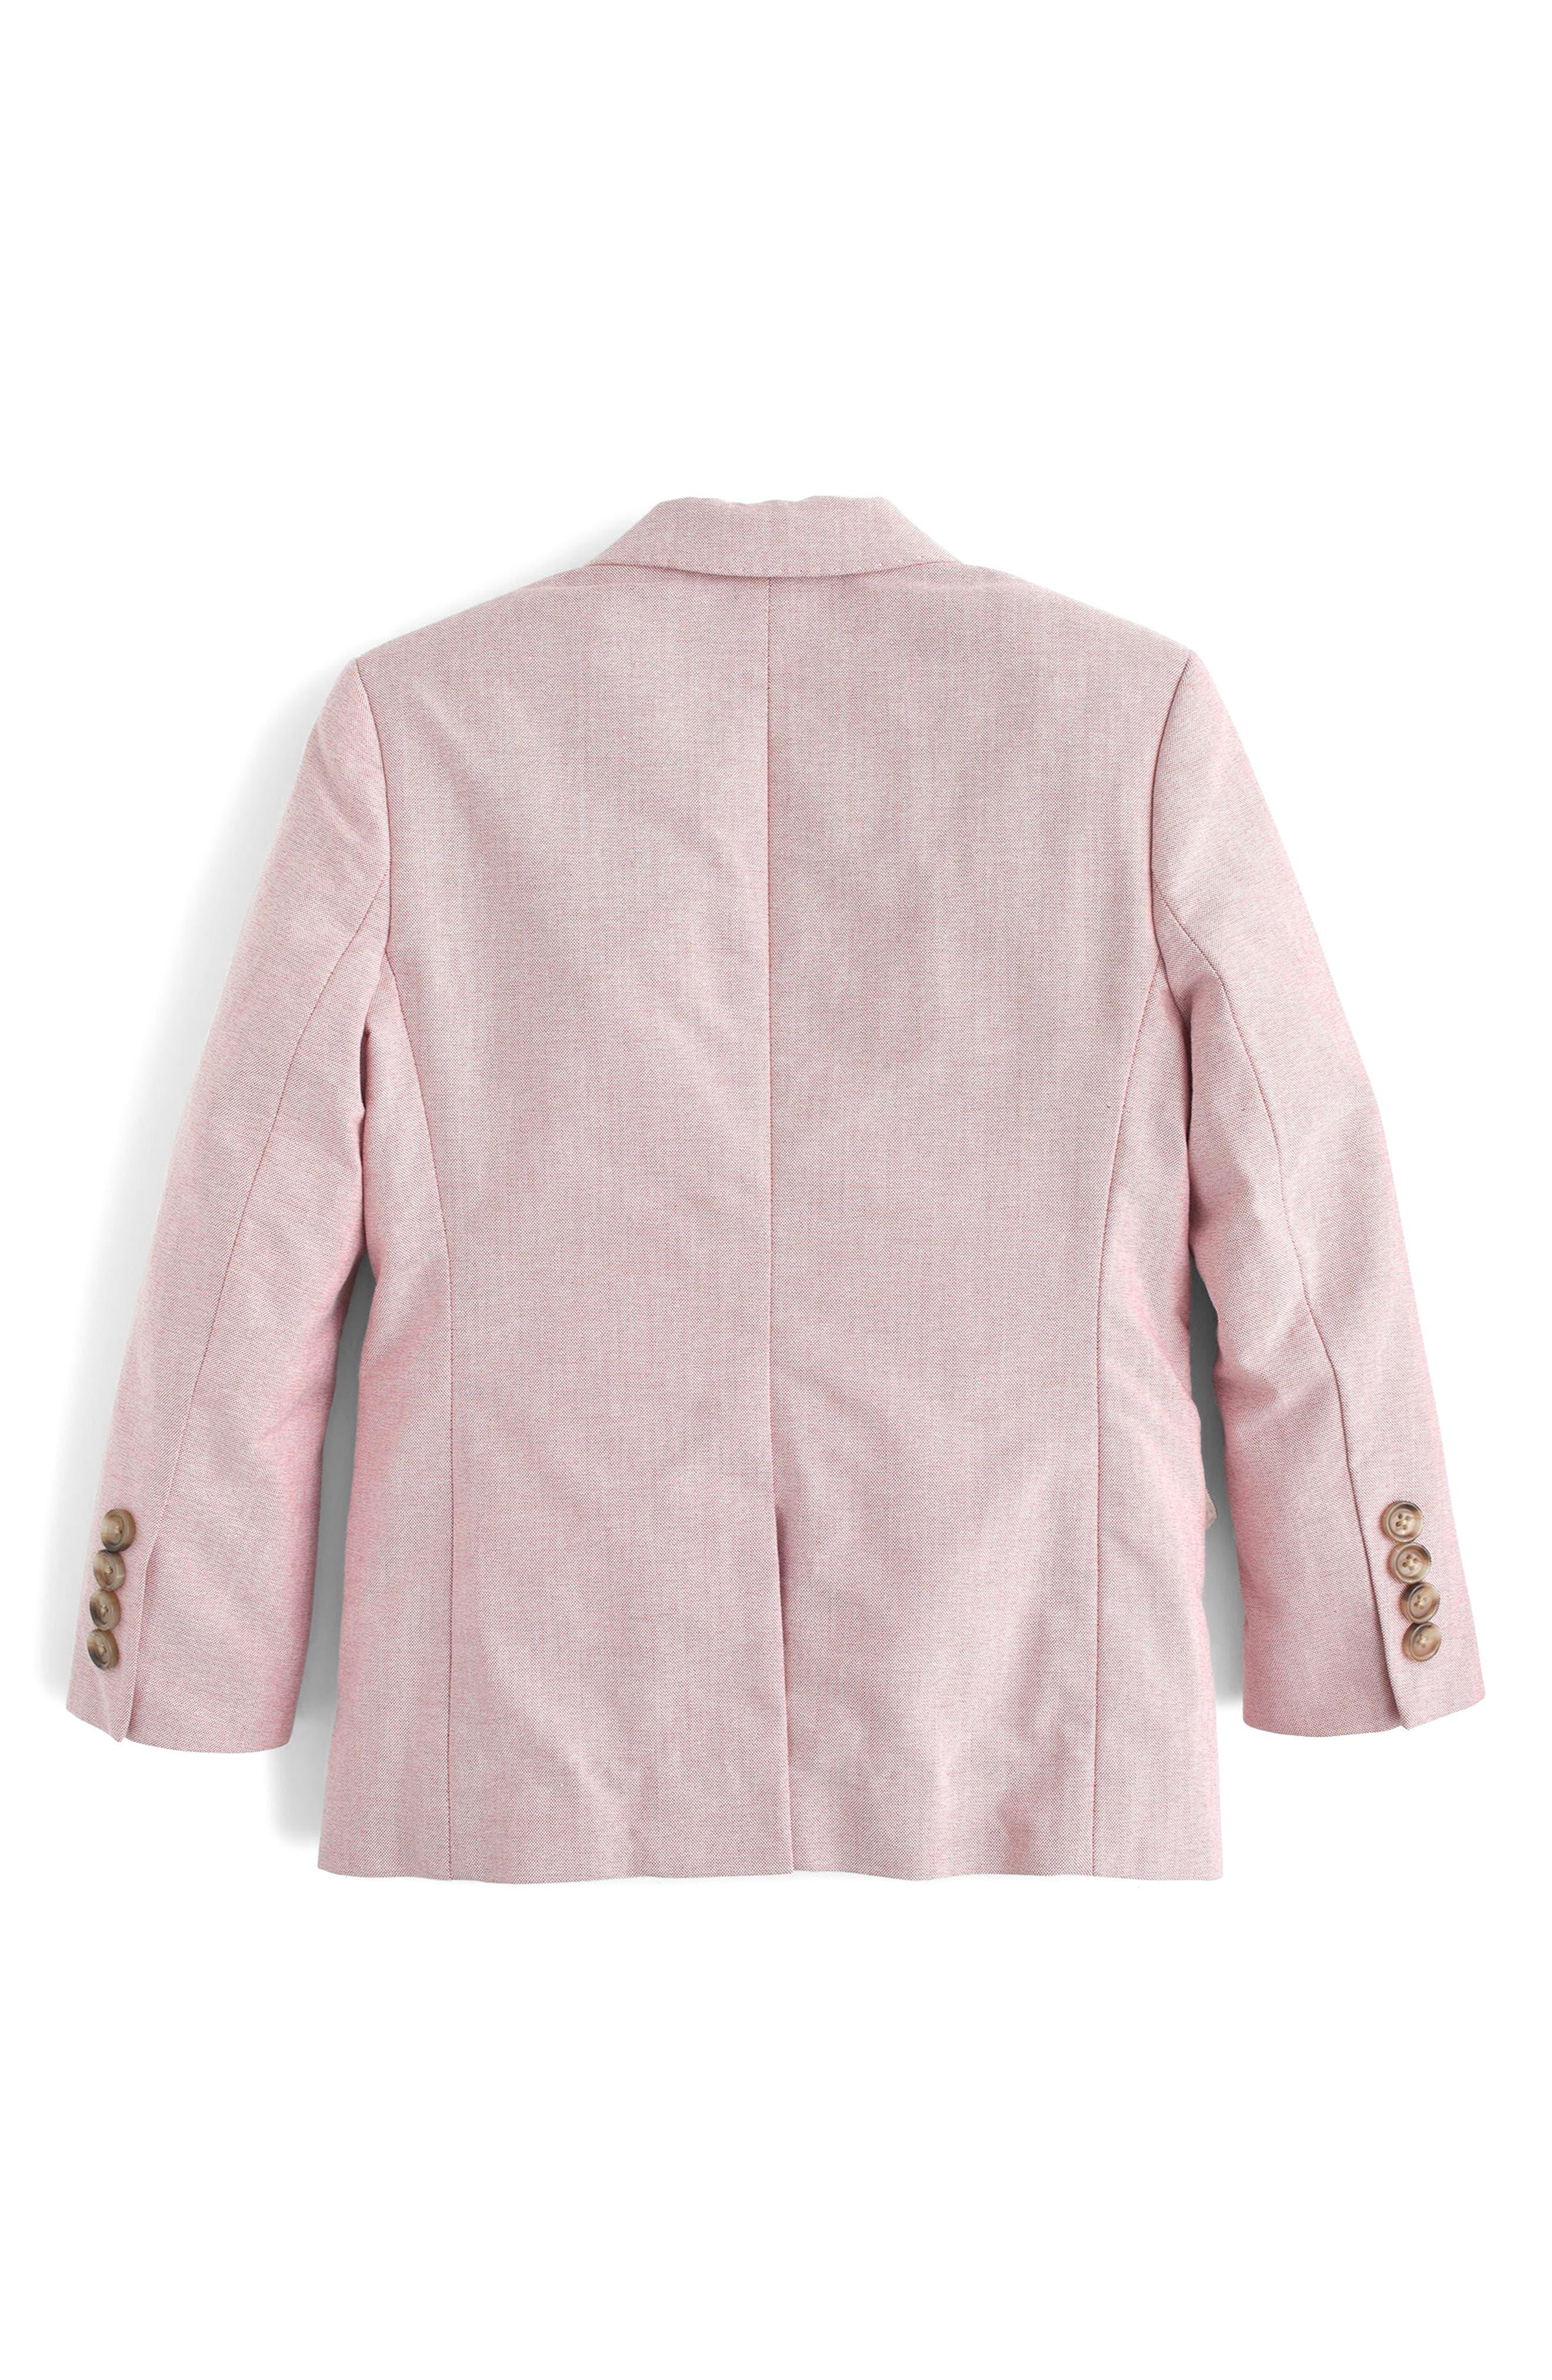 Ludlow Stretch Oxford Suit Jacket,                             Alternate thumbnail 2, color,                             600